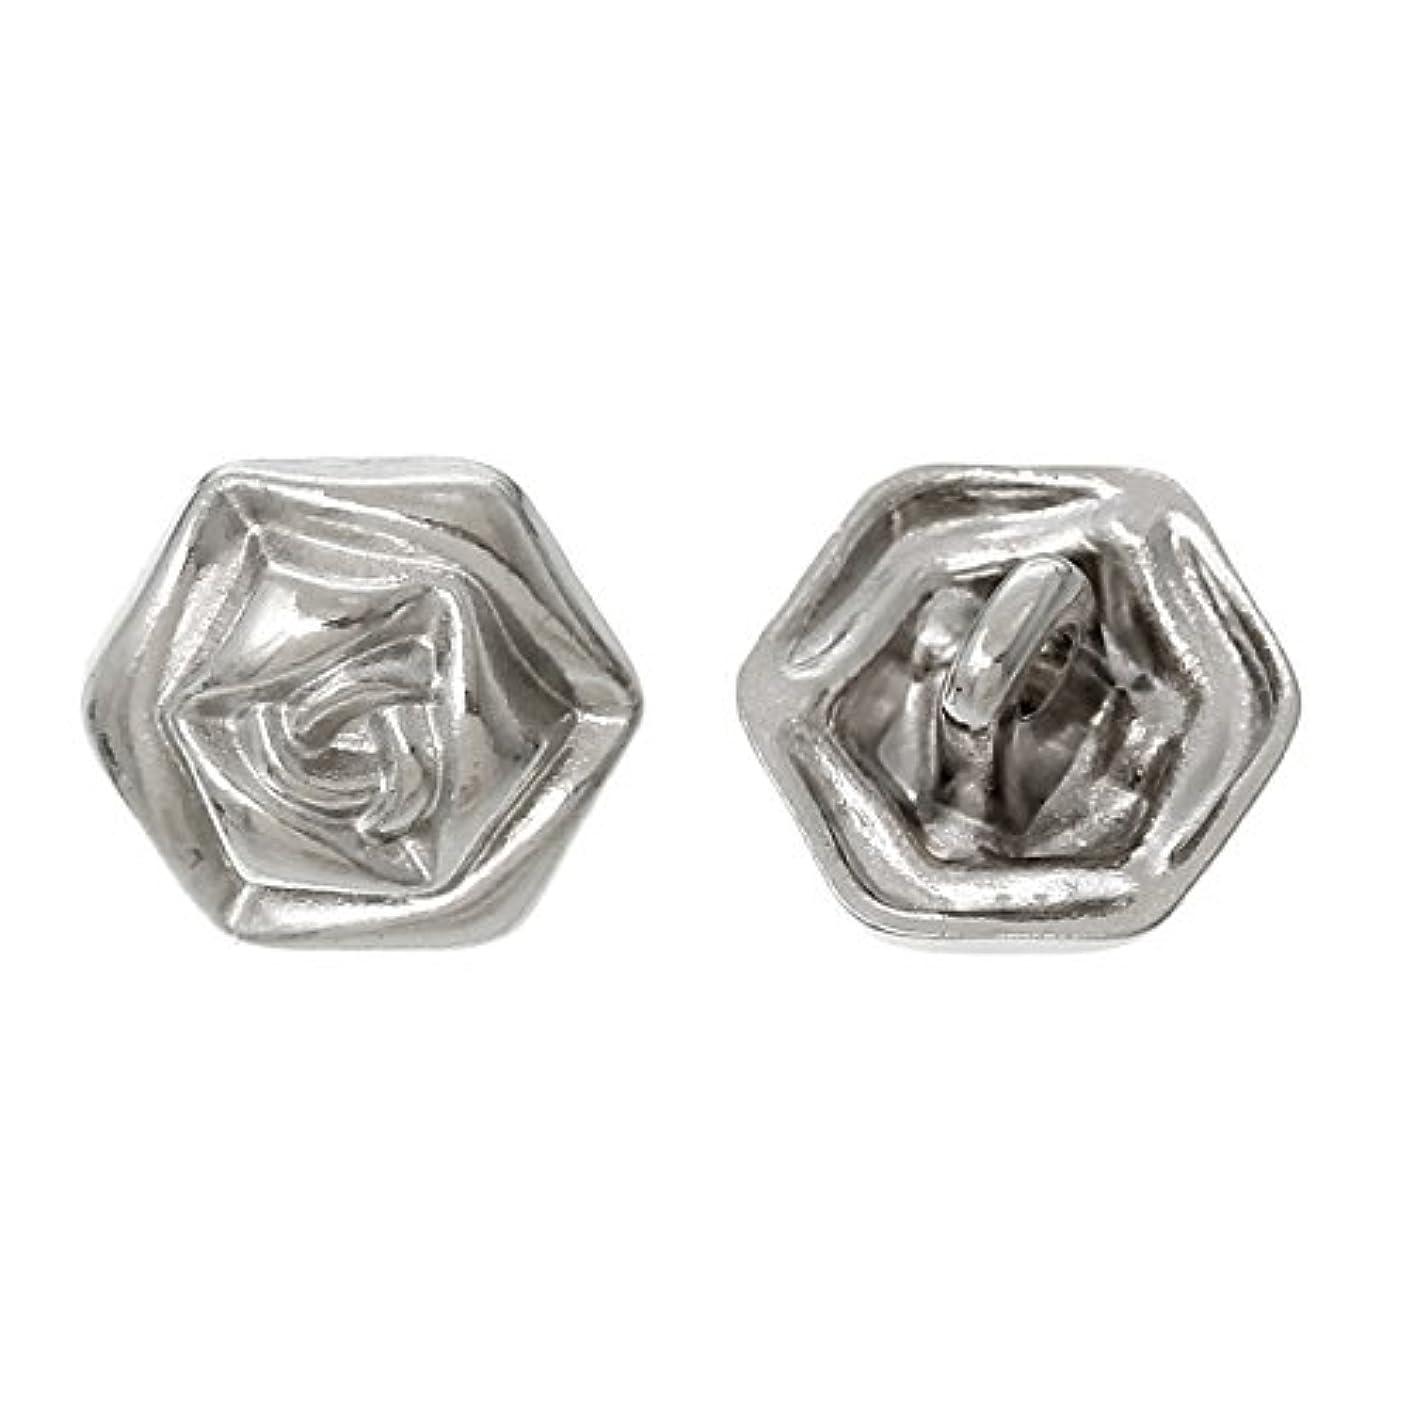 PEPPERLONELY Brand 10PC Shank Metal Button Flower Silver Tone Single Hole Lead & Nickel Free 13.0mm x 12.0mm( 4/8 x 4/8)